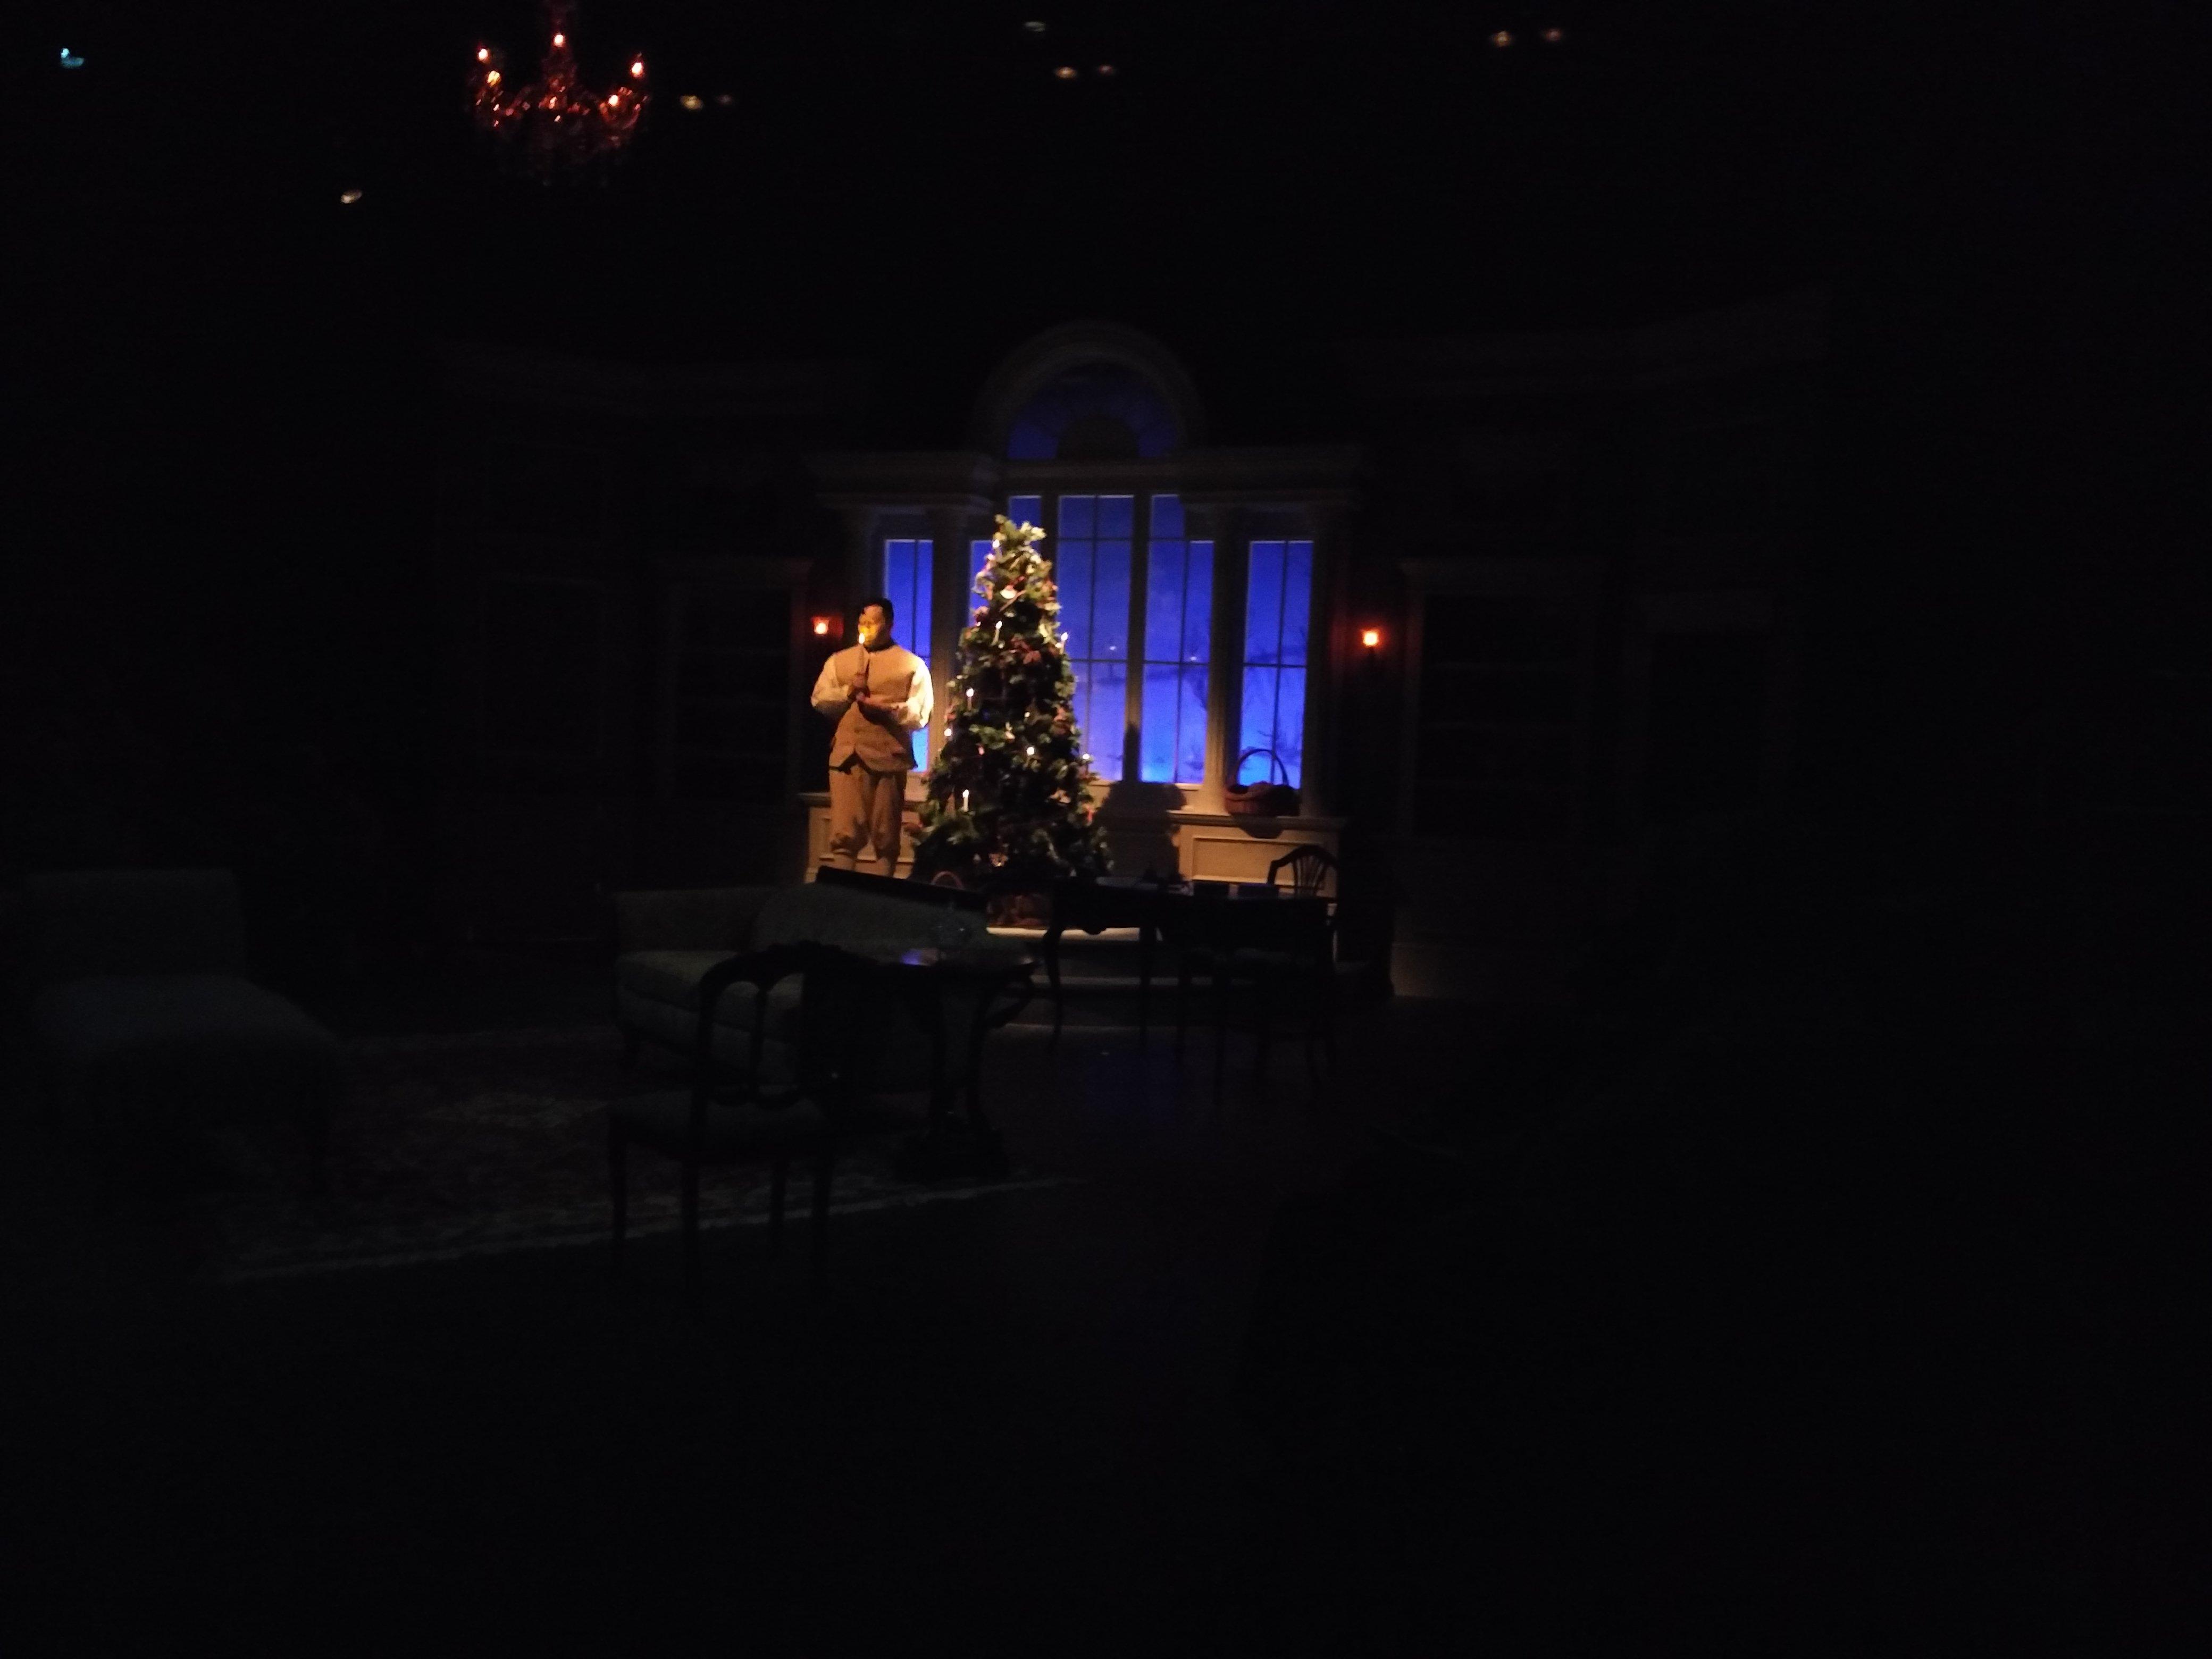 Miss. Bennet: Christmas at Pemberley